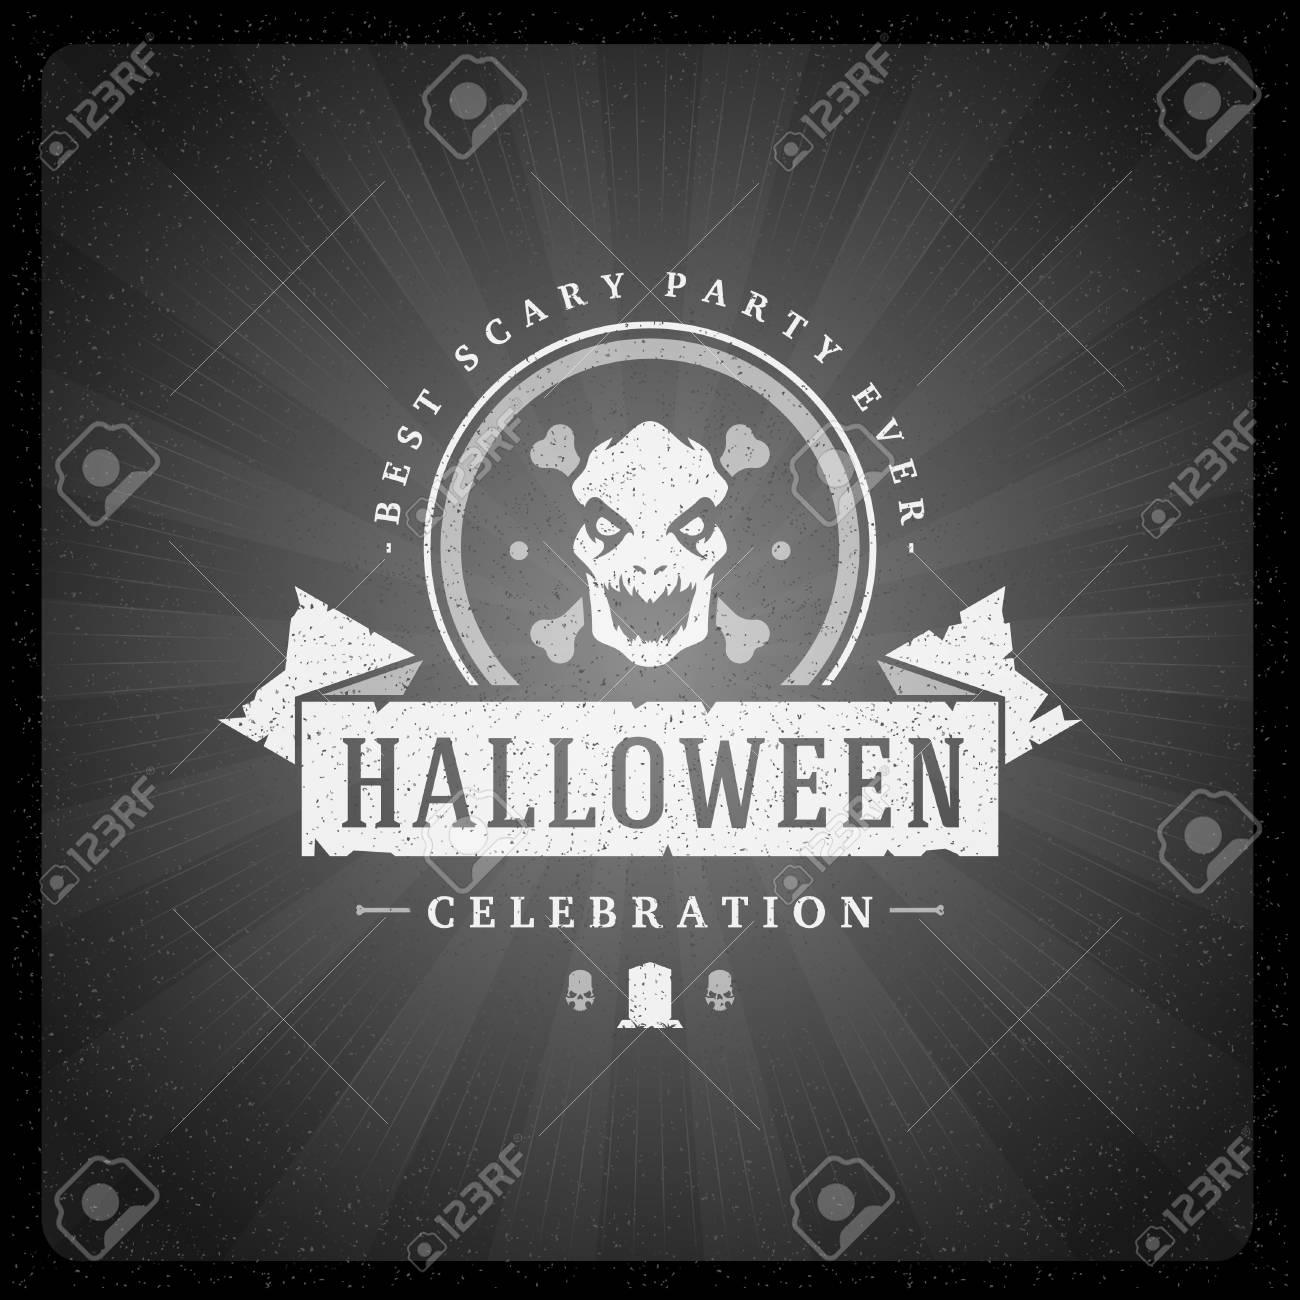 halloween vector illustration on movie ending screen stock vector 87382420